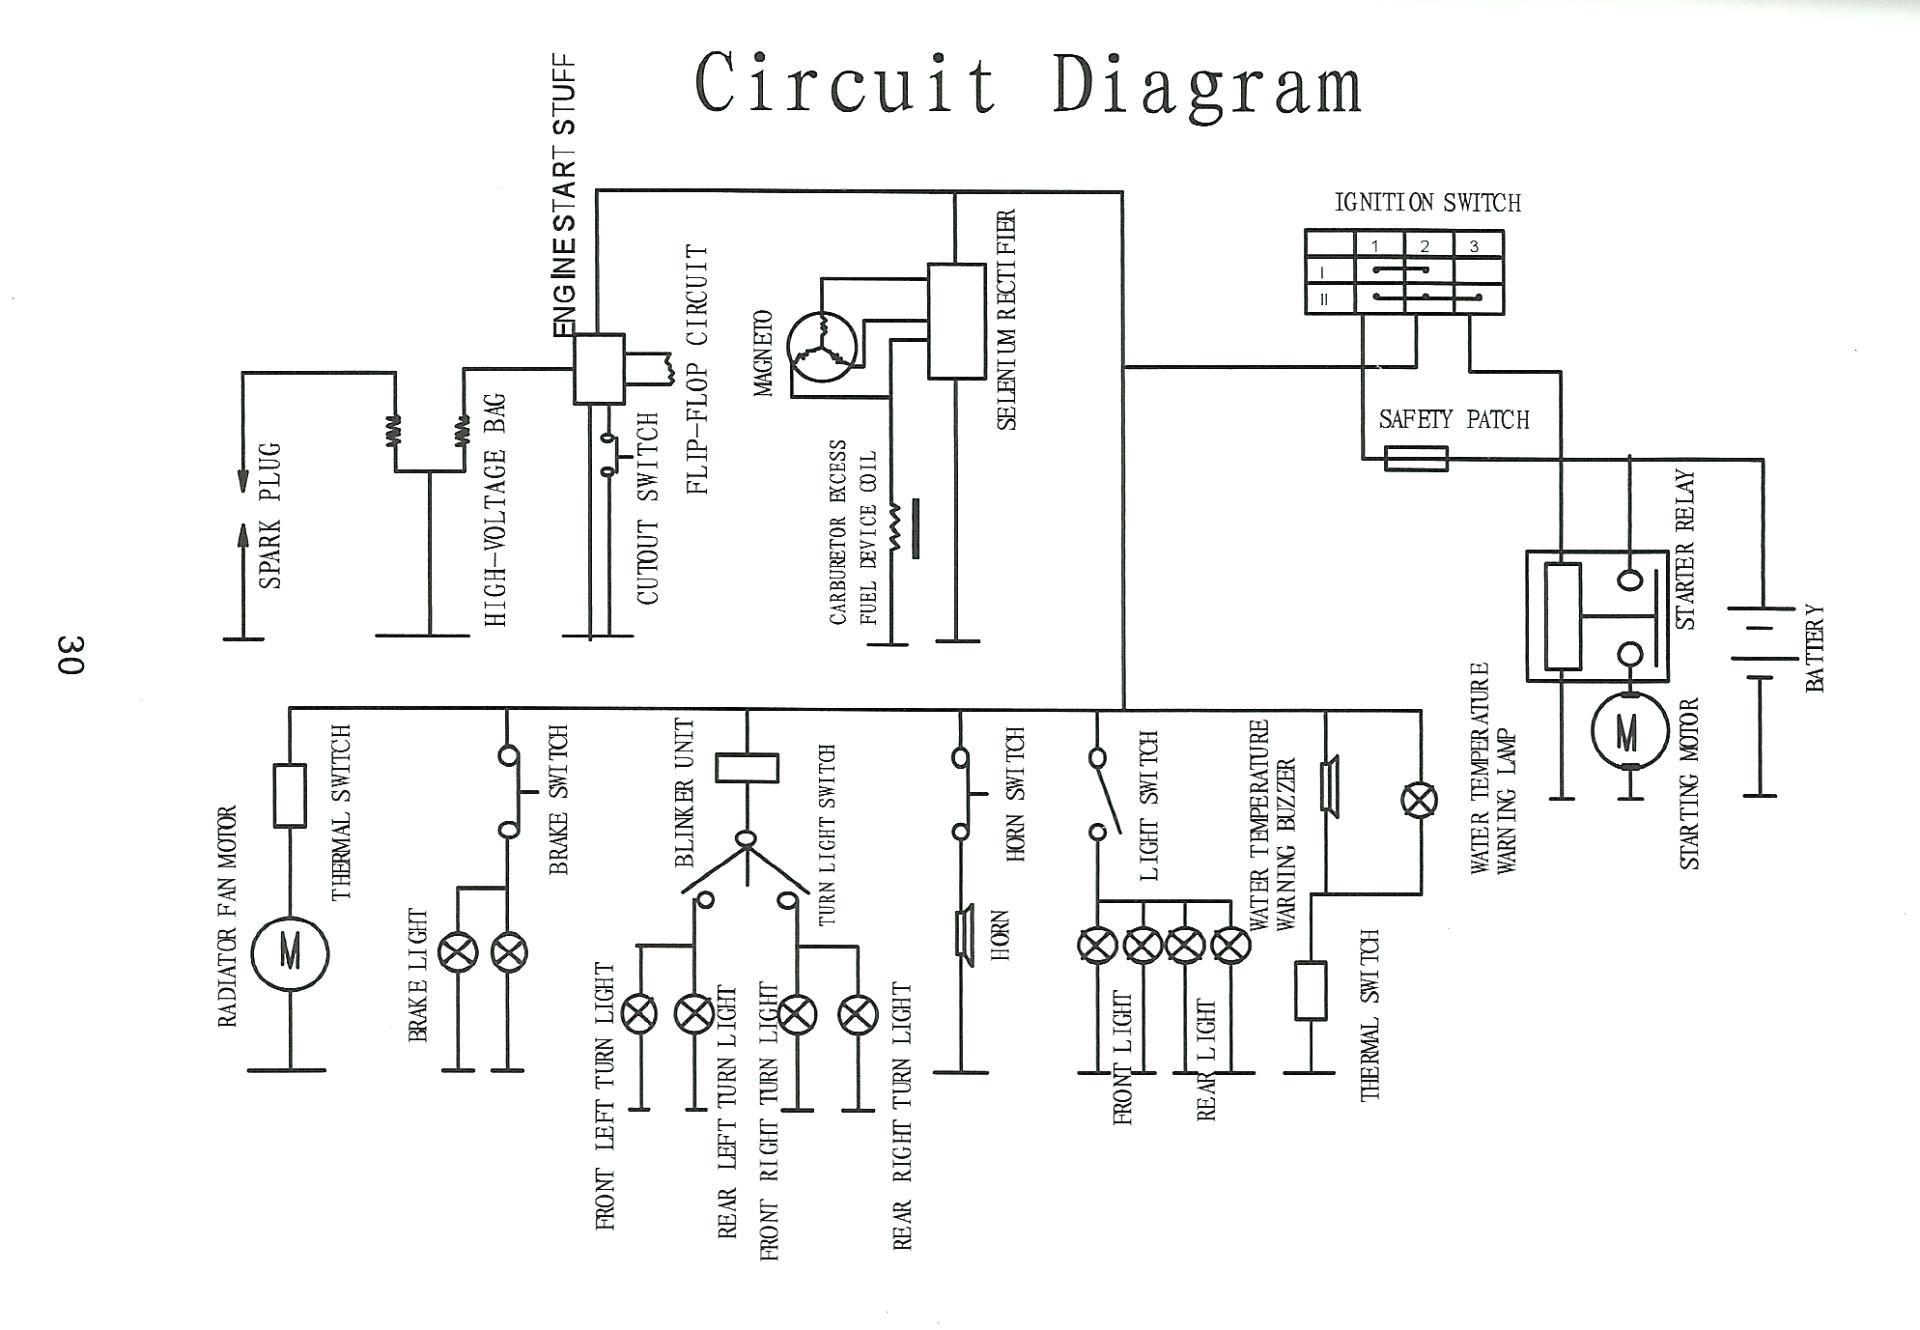 Roketa Go Kart 100 Cc Wiring Diagram 110cc chinese atv ... on kawasaki 250cc atv, kandi kd 250mb2 parts, yamaha 250cc atv, tao tao 250cc atv, honda 250cc atv, kandi spyder buggy parts,